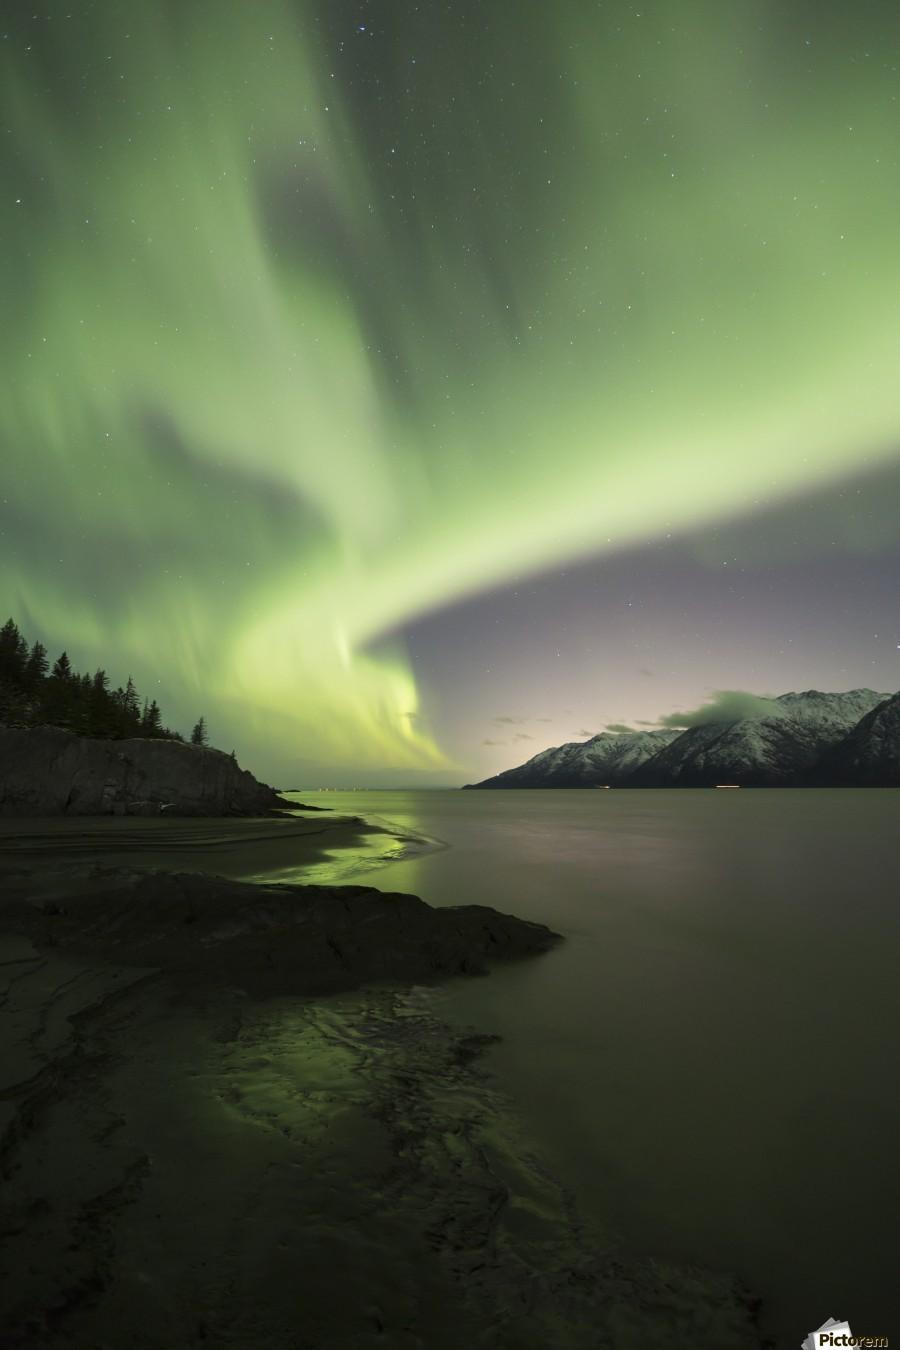 Aurora Borealis dancing above the Chugach Mountains and Turnagain Arm, Kenai Peninsula, Southcentral, Alaska  Print